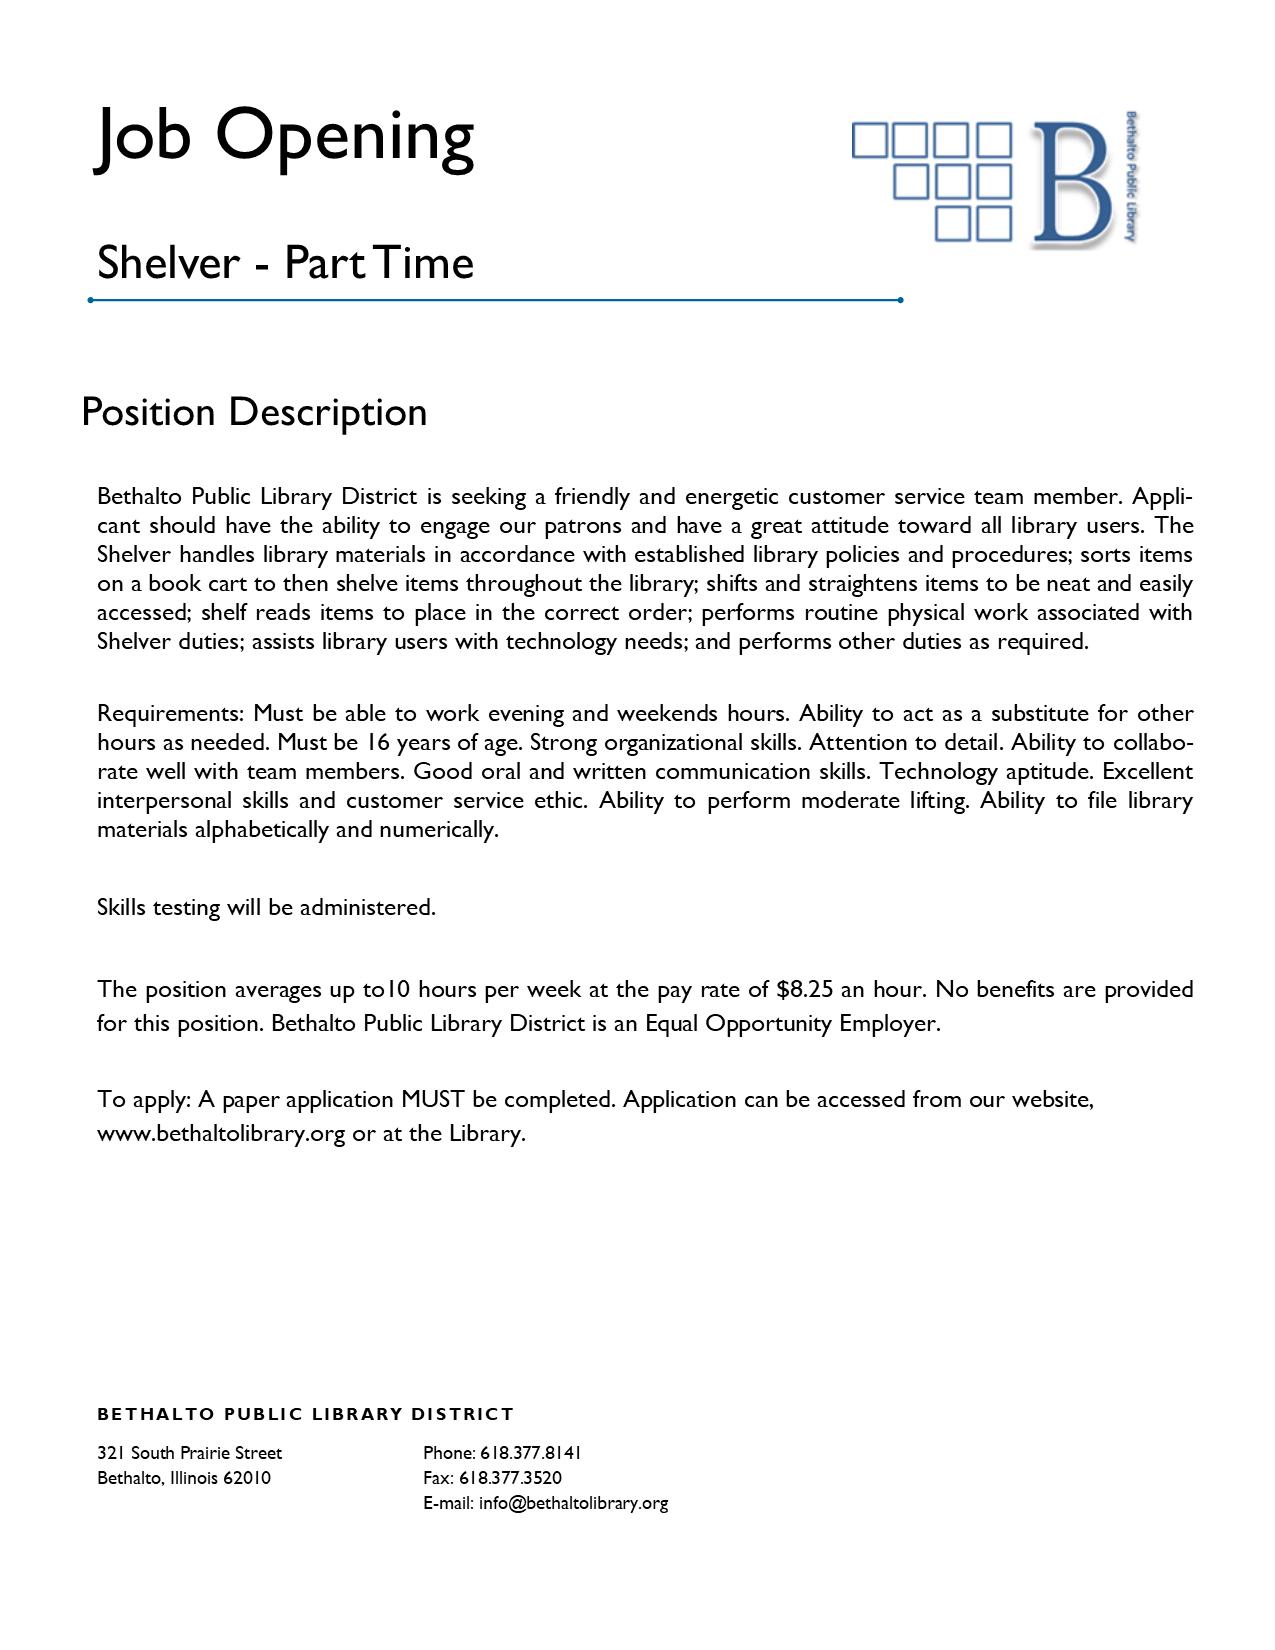 Shelver Job Opening 2019-6.png